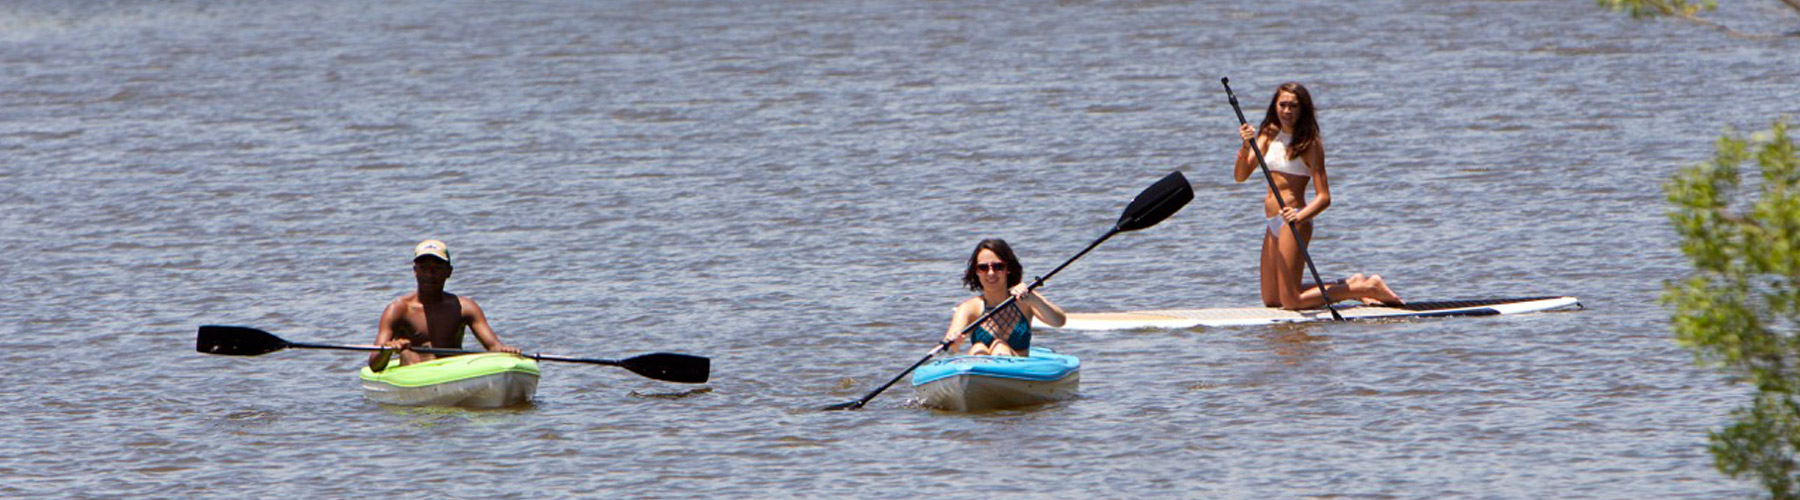 Boats Kayaks Canoes